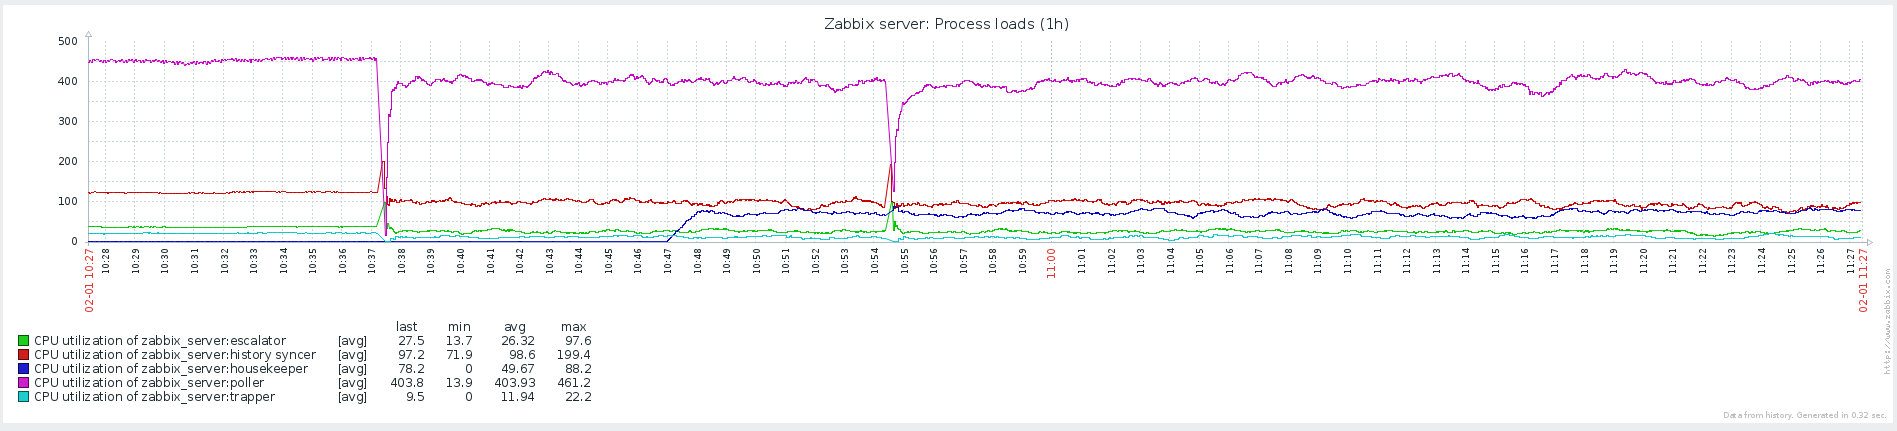 Вышел Zabbix 3.0 - 8